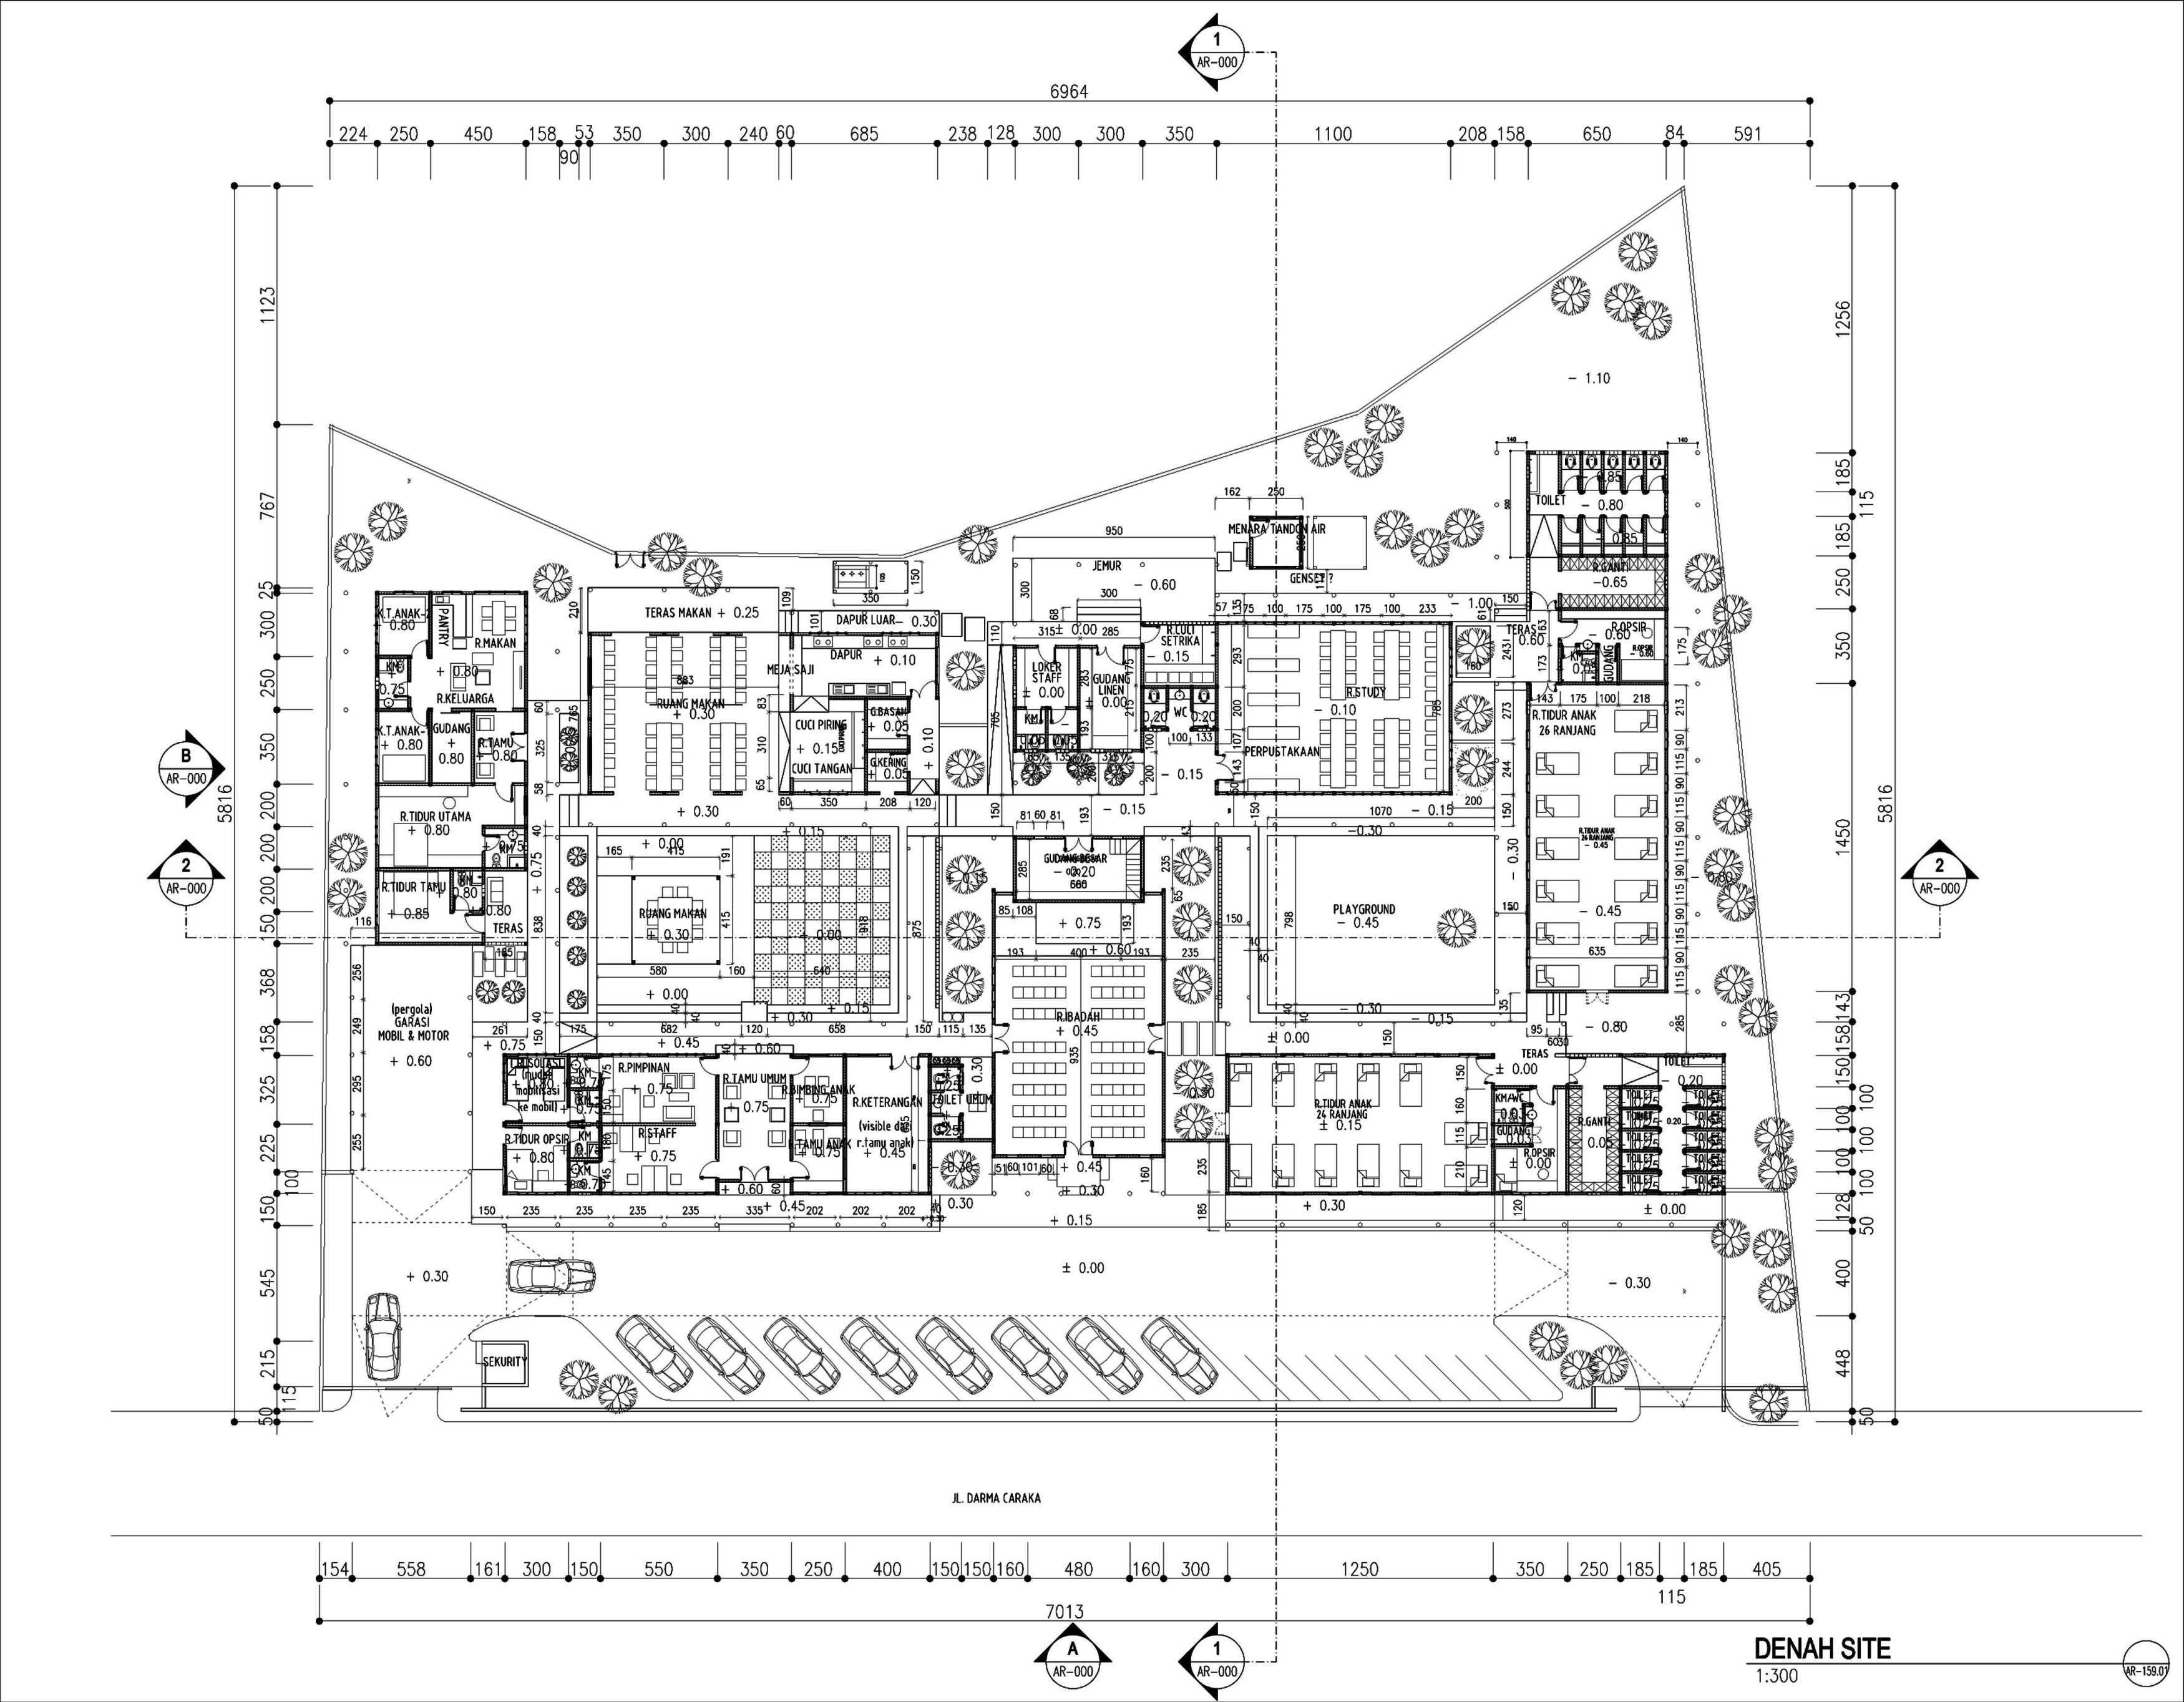 Gubah Ruang Studio Bk Putri Orphanages Pulau Nias, Sumatera Utara, Indonesia Pulau Nias, Sumatera Utara, Indonesia Floorplan   50665